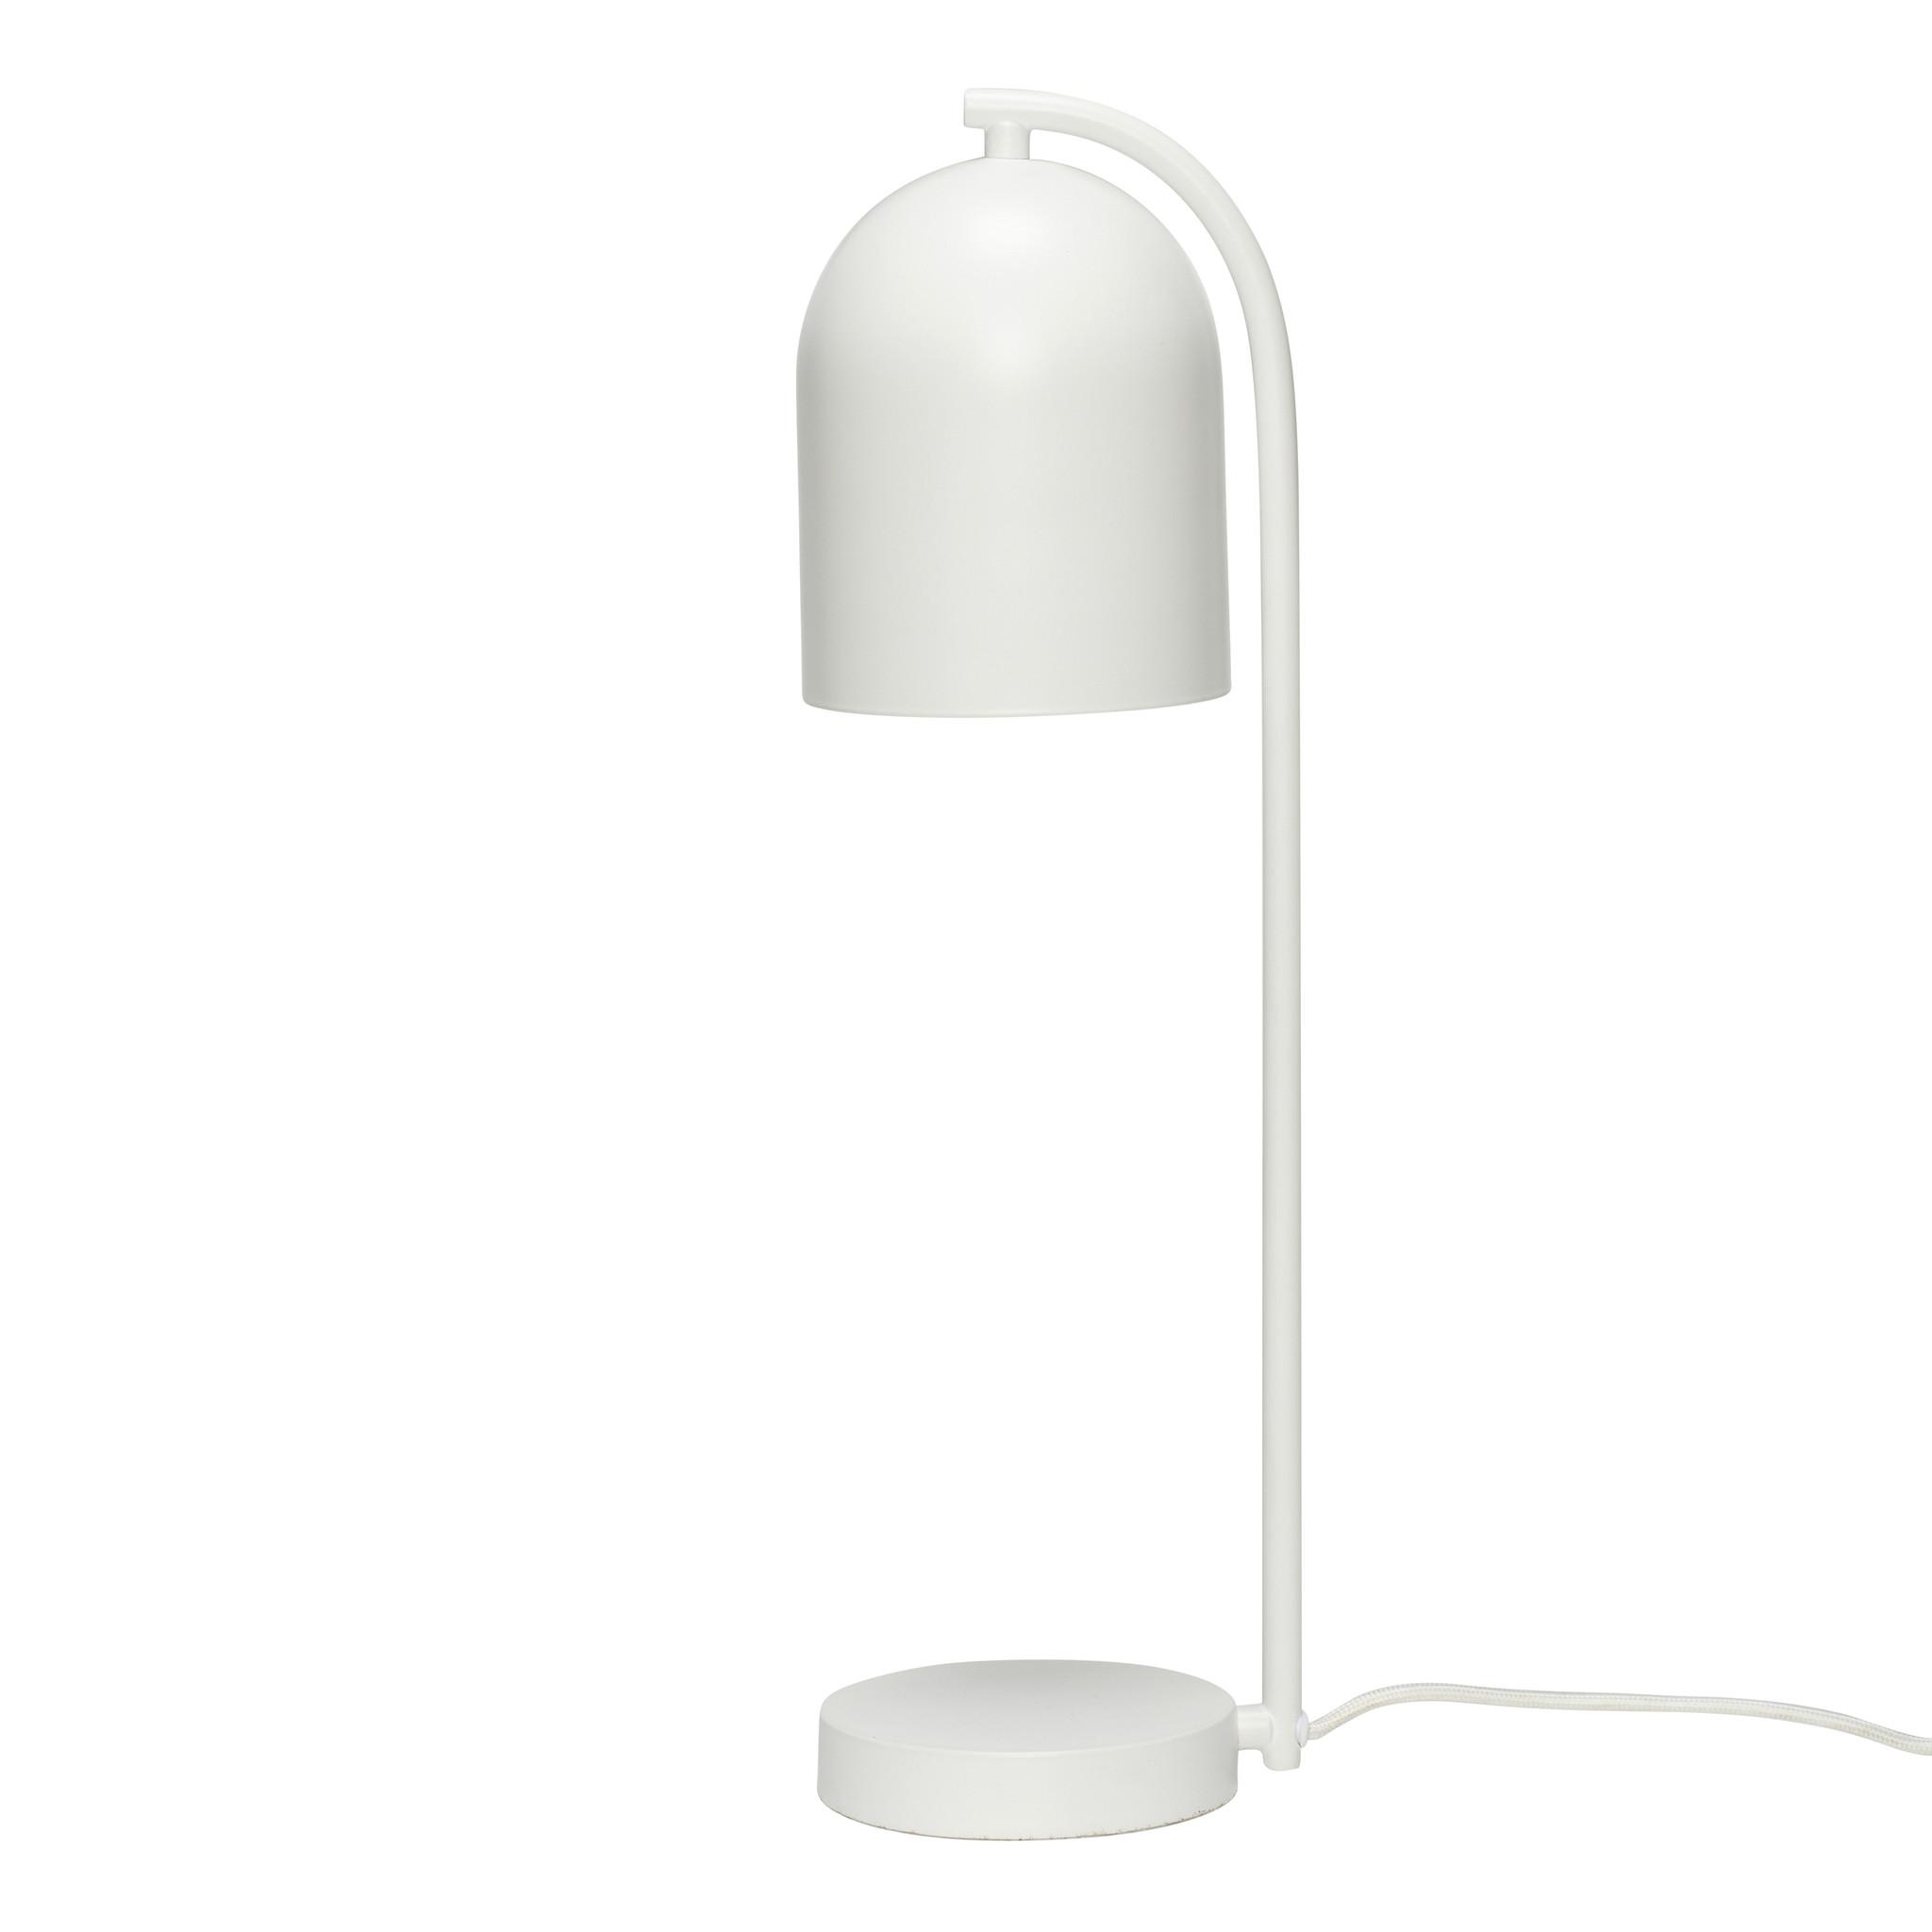 Hubsch Tafellamp, wit